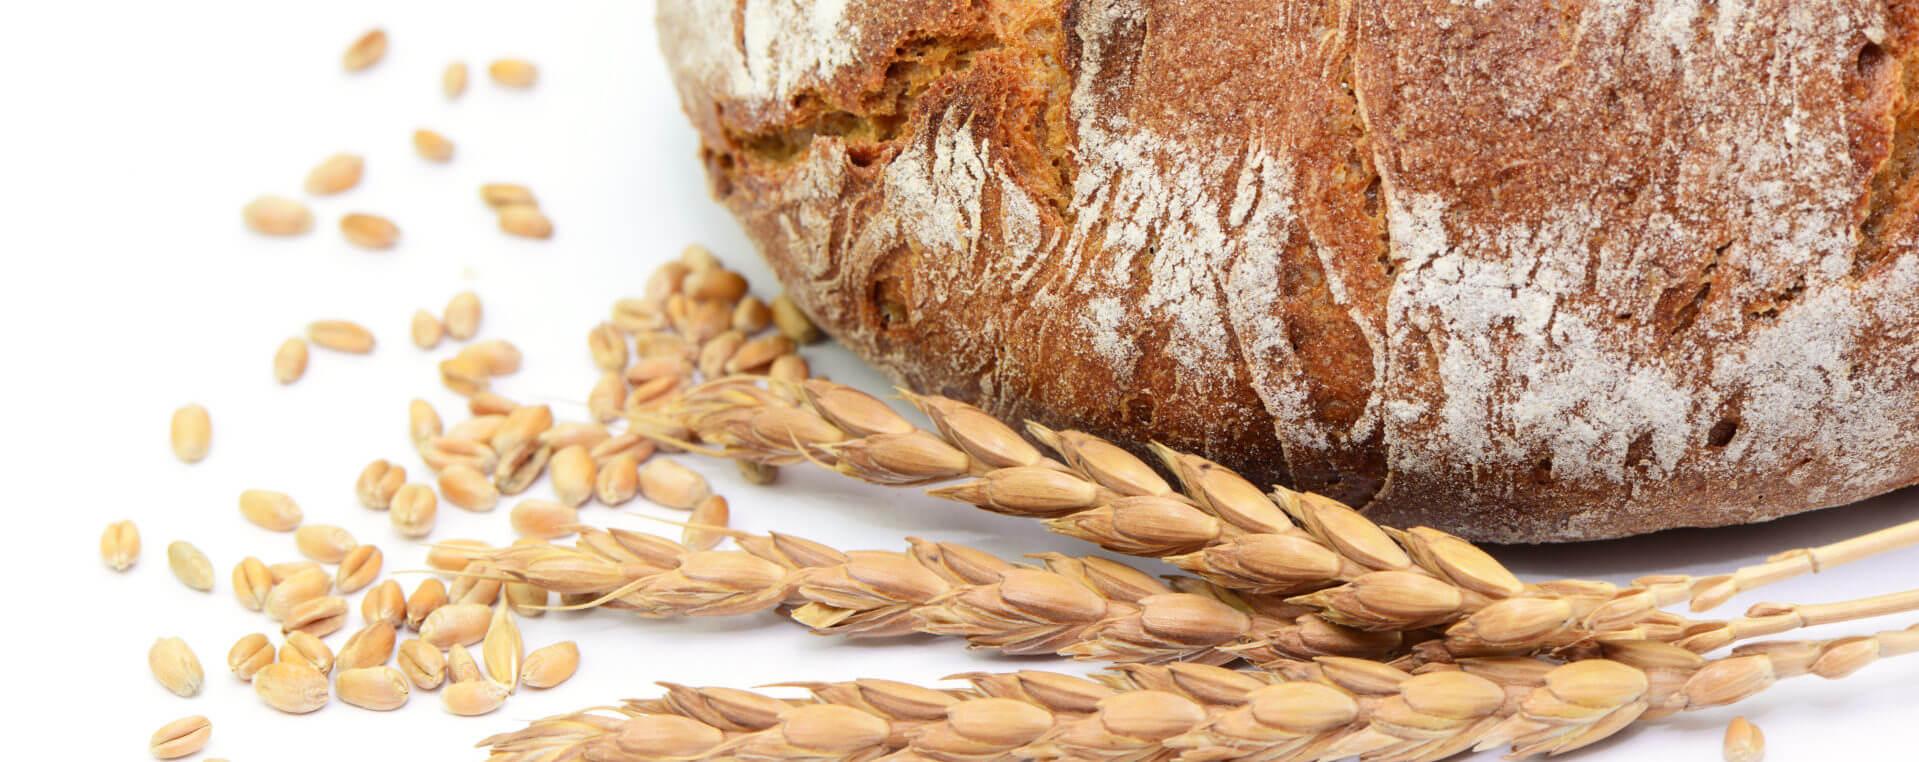 Brotlaib und Körner